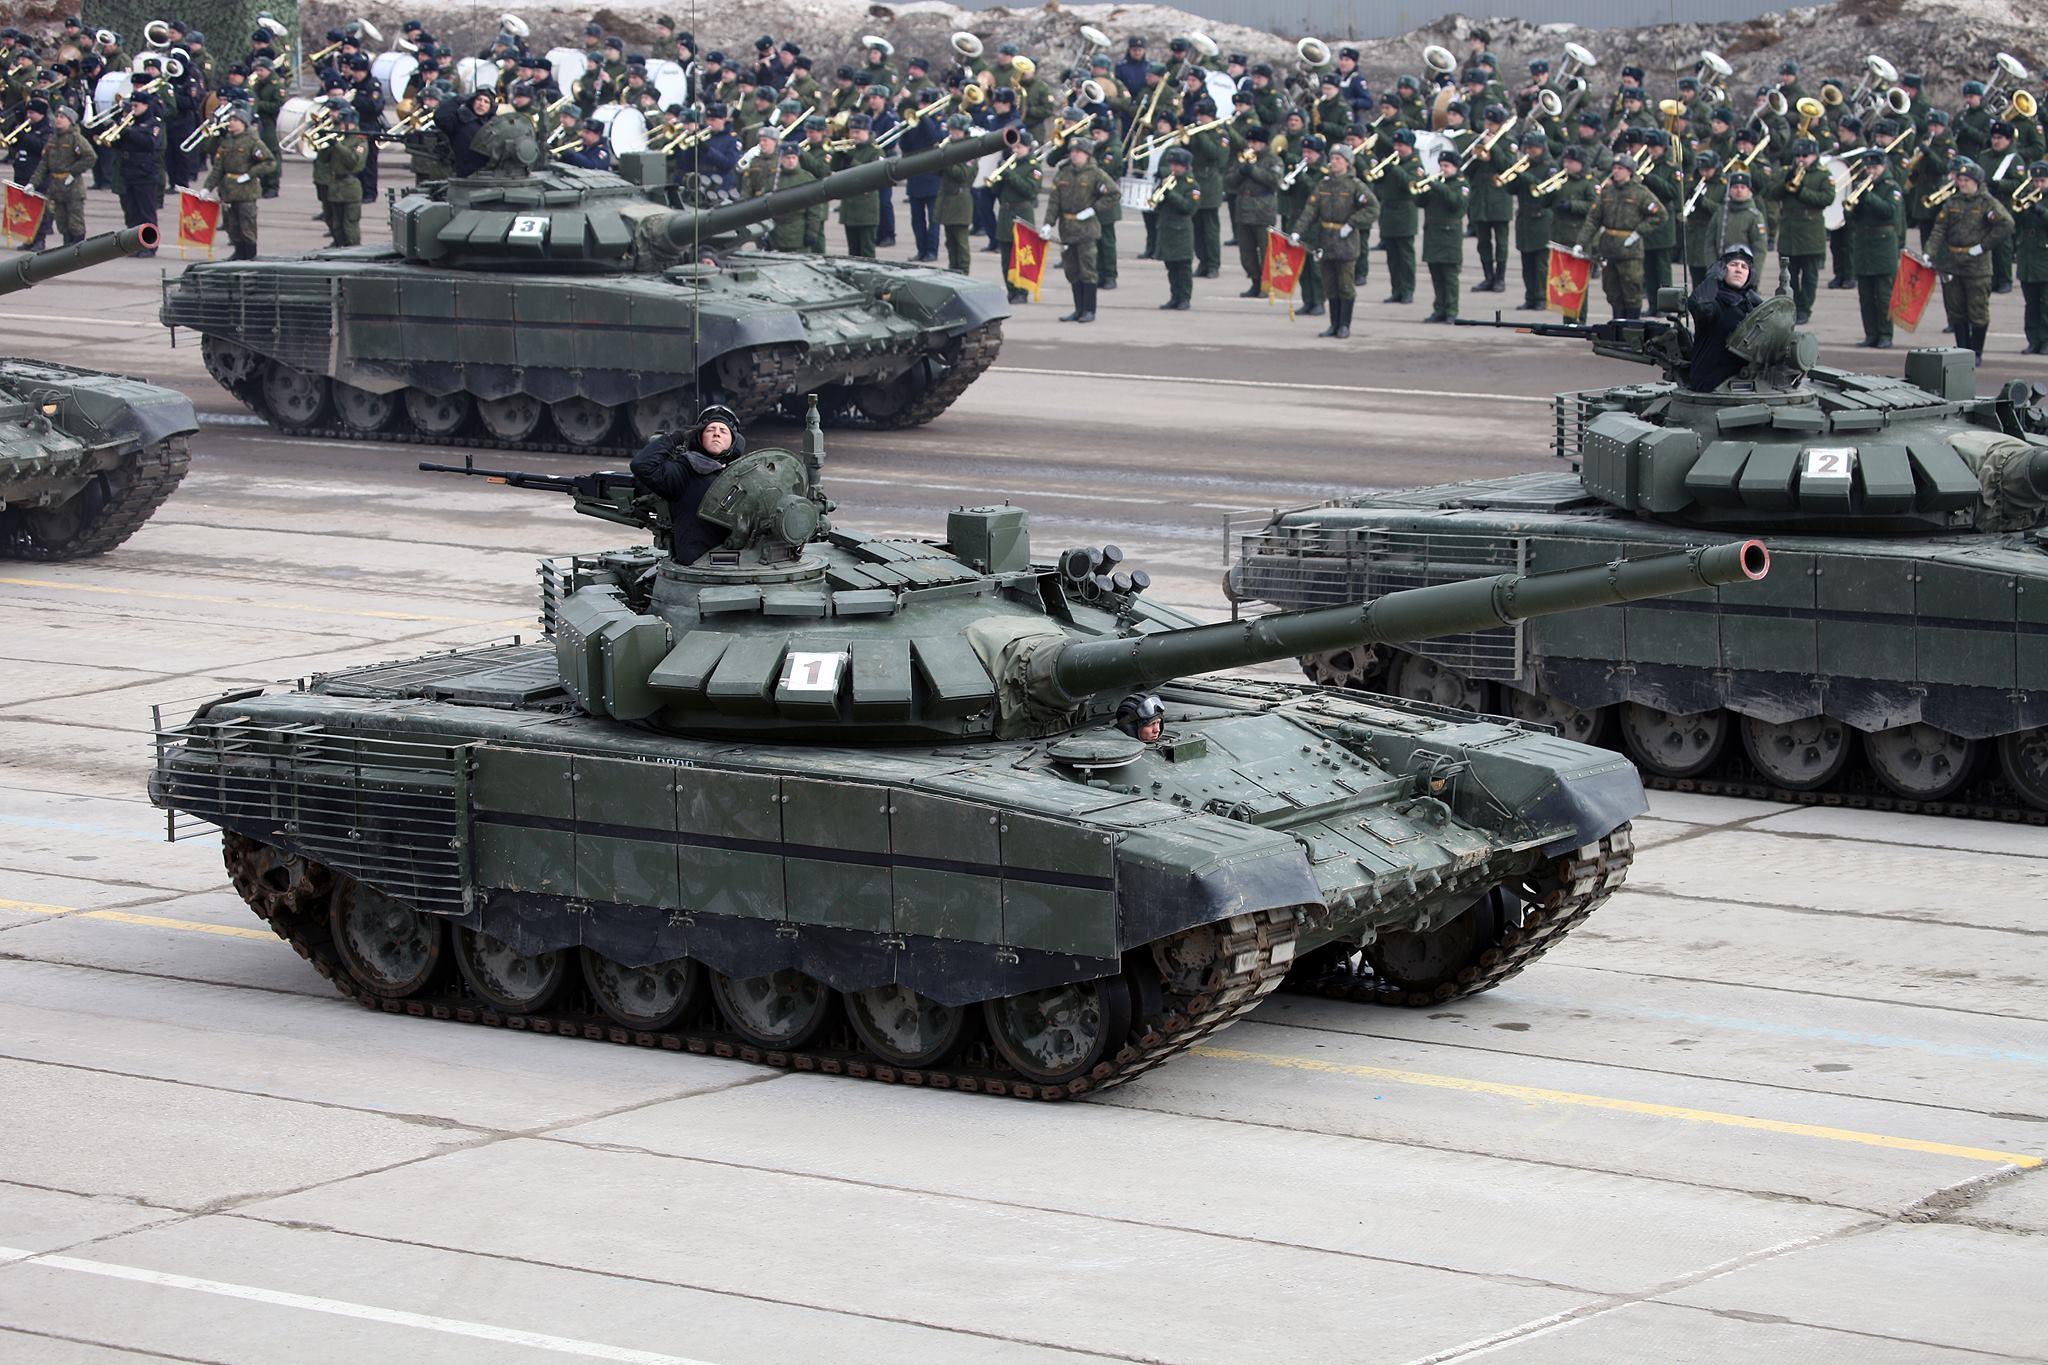 T-72 ΜΒΤ modernisation and variants - Page 15 4070368_original